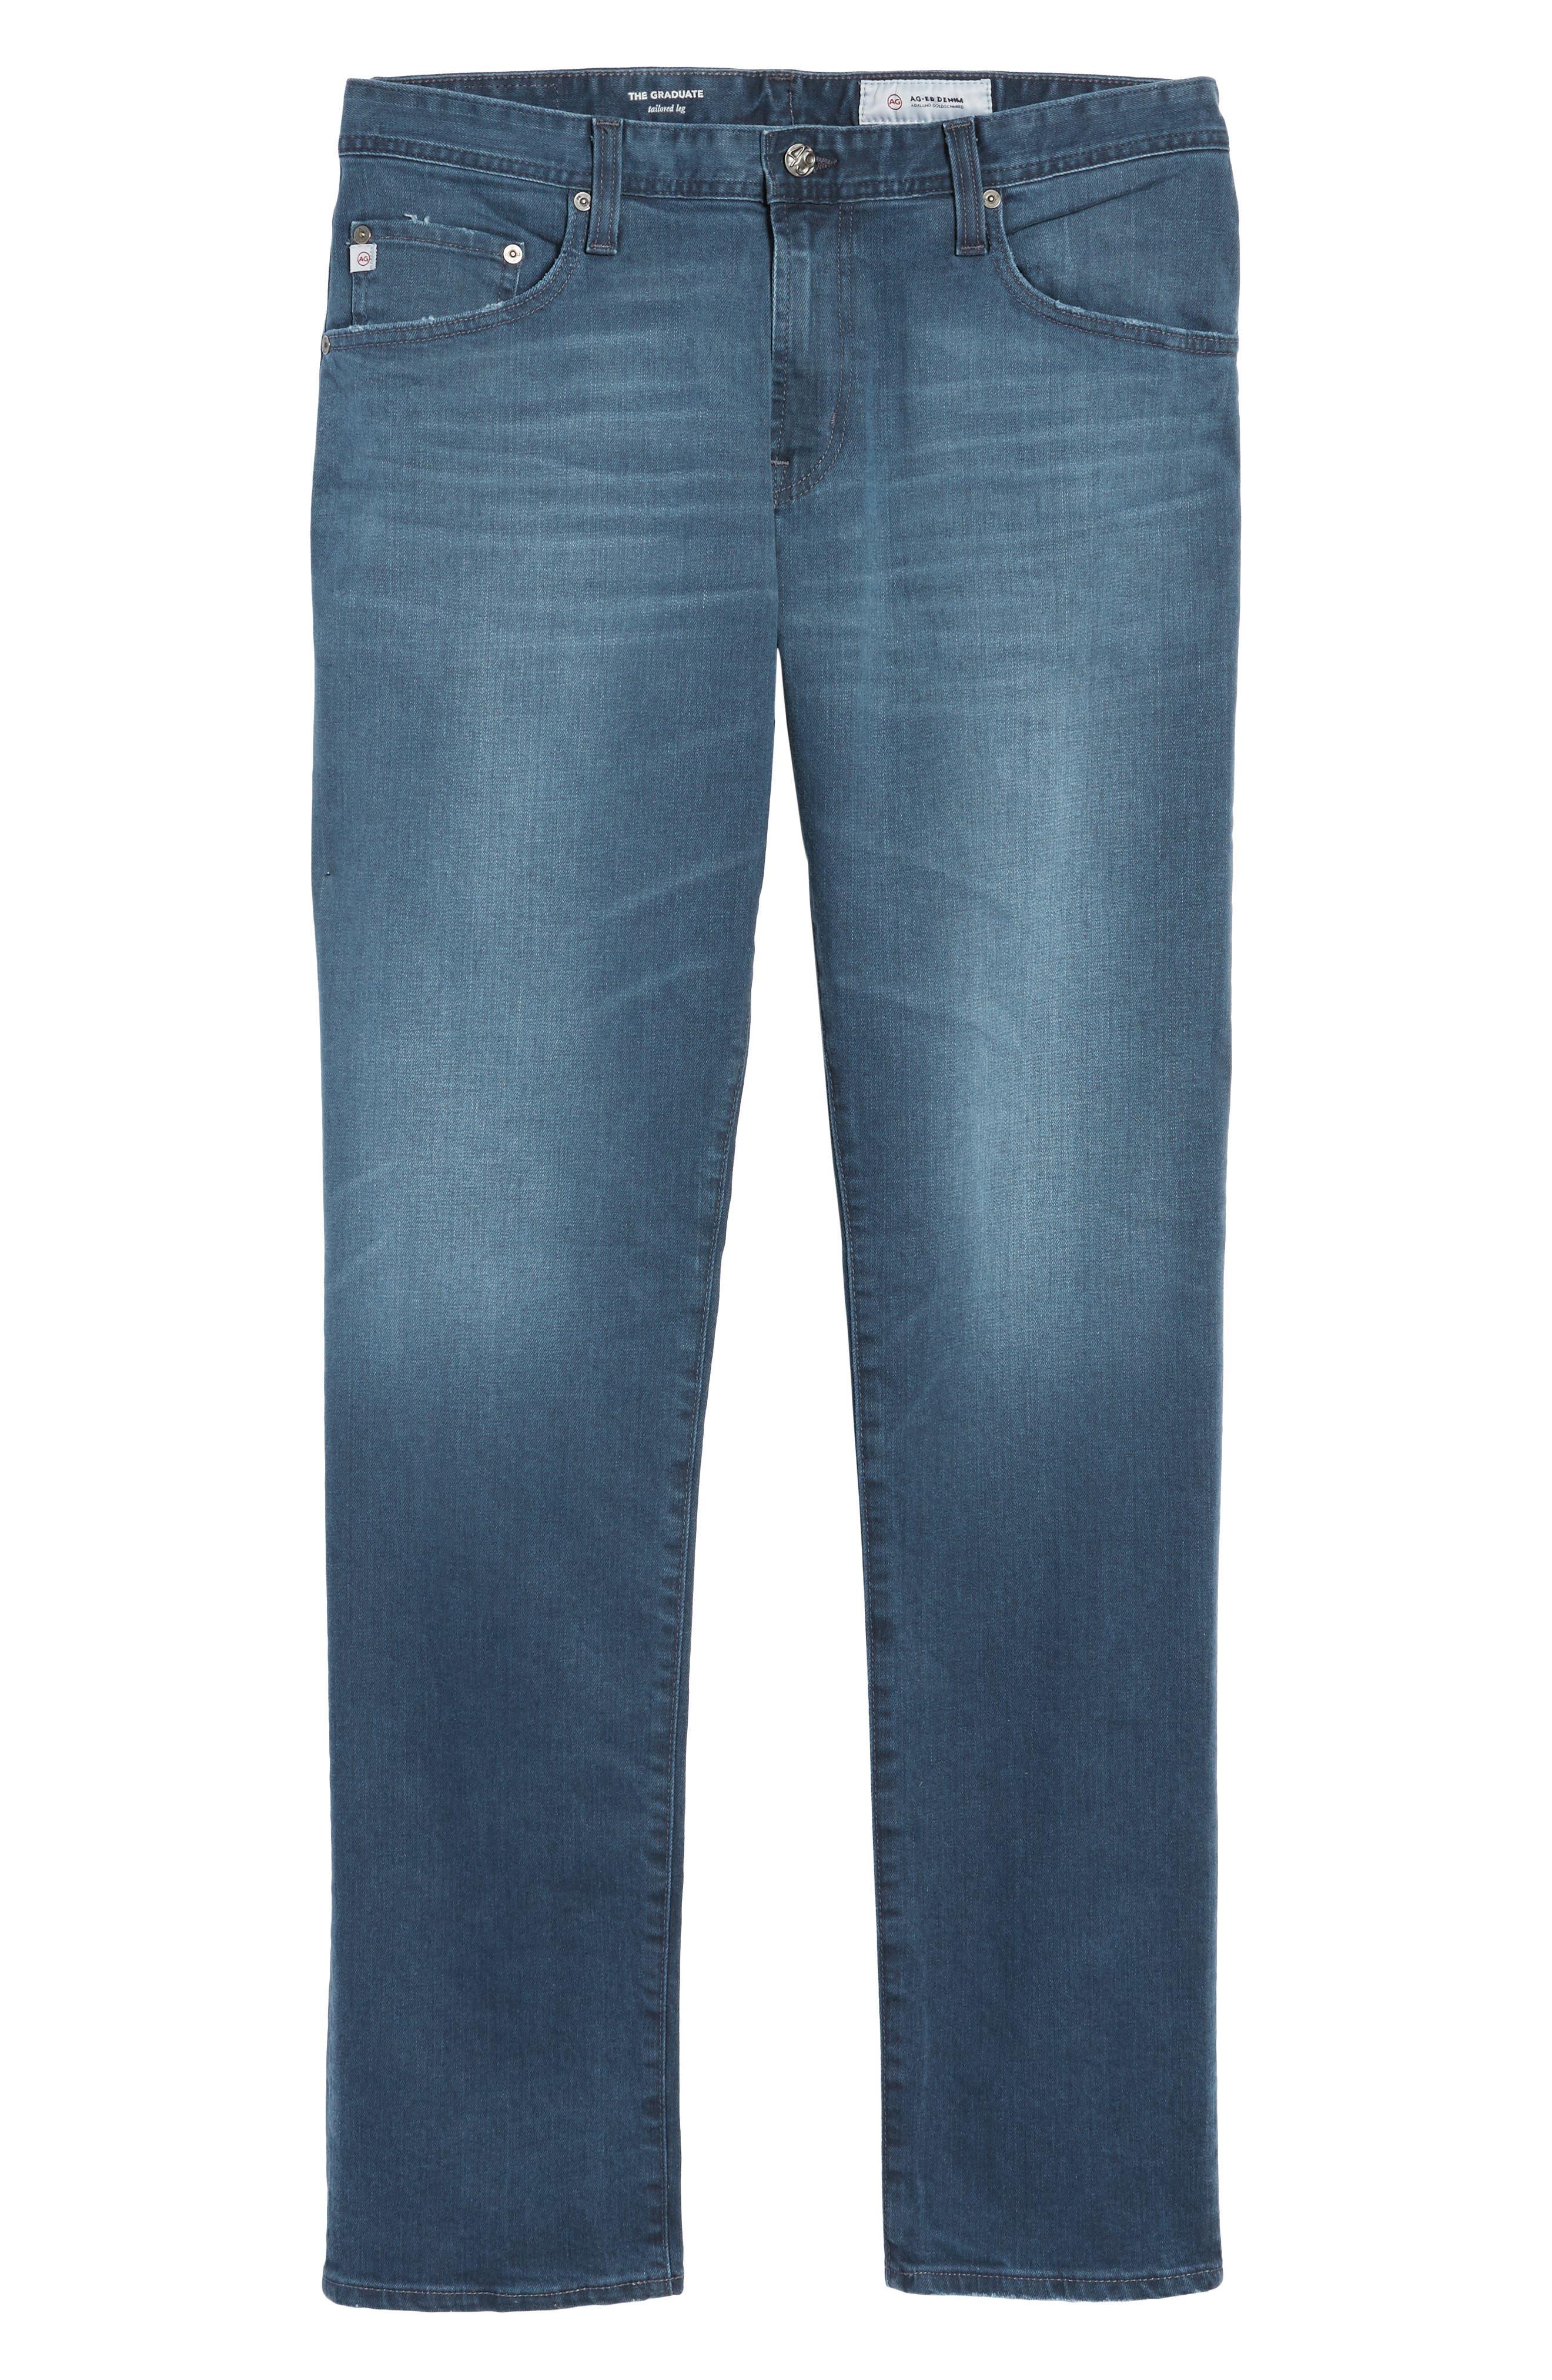 Graduate Slim Straight Leg Jeans,                             Alternate thumbnail 6, color,                             7 YEARS BLUE PERIL